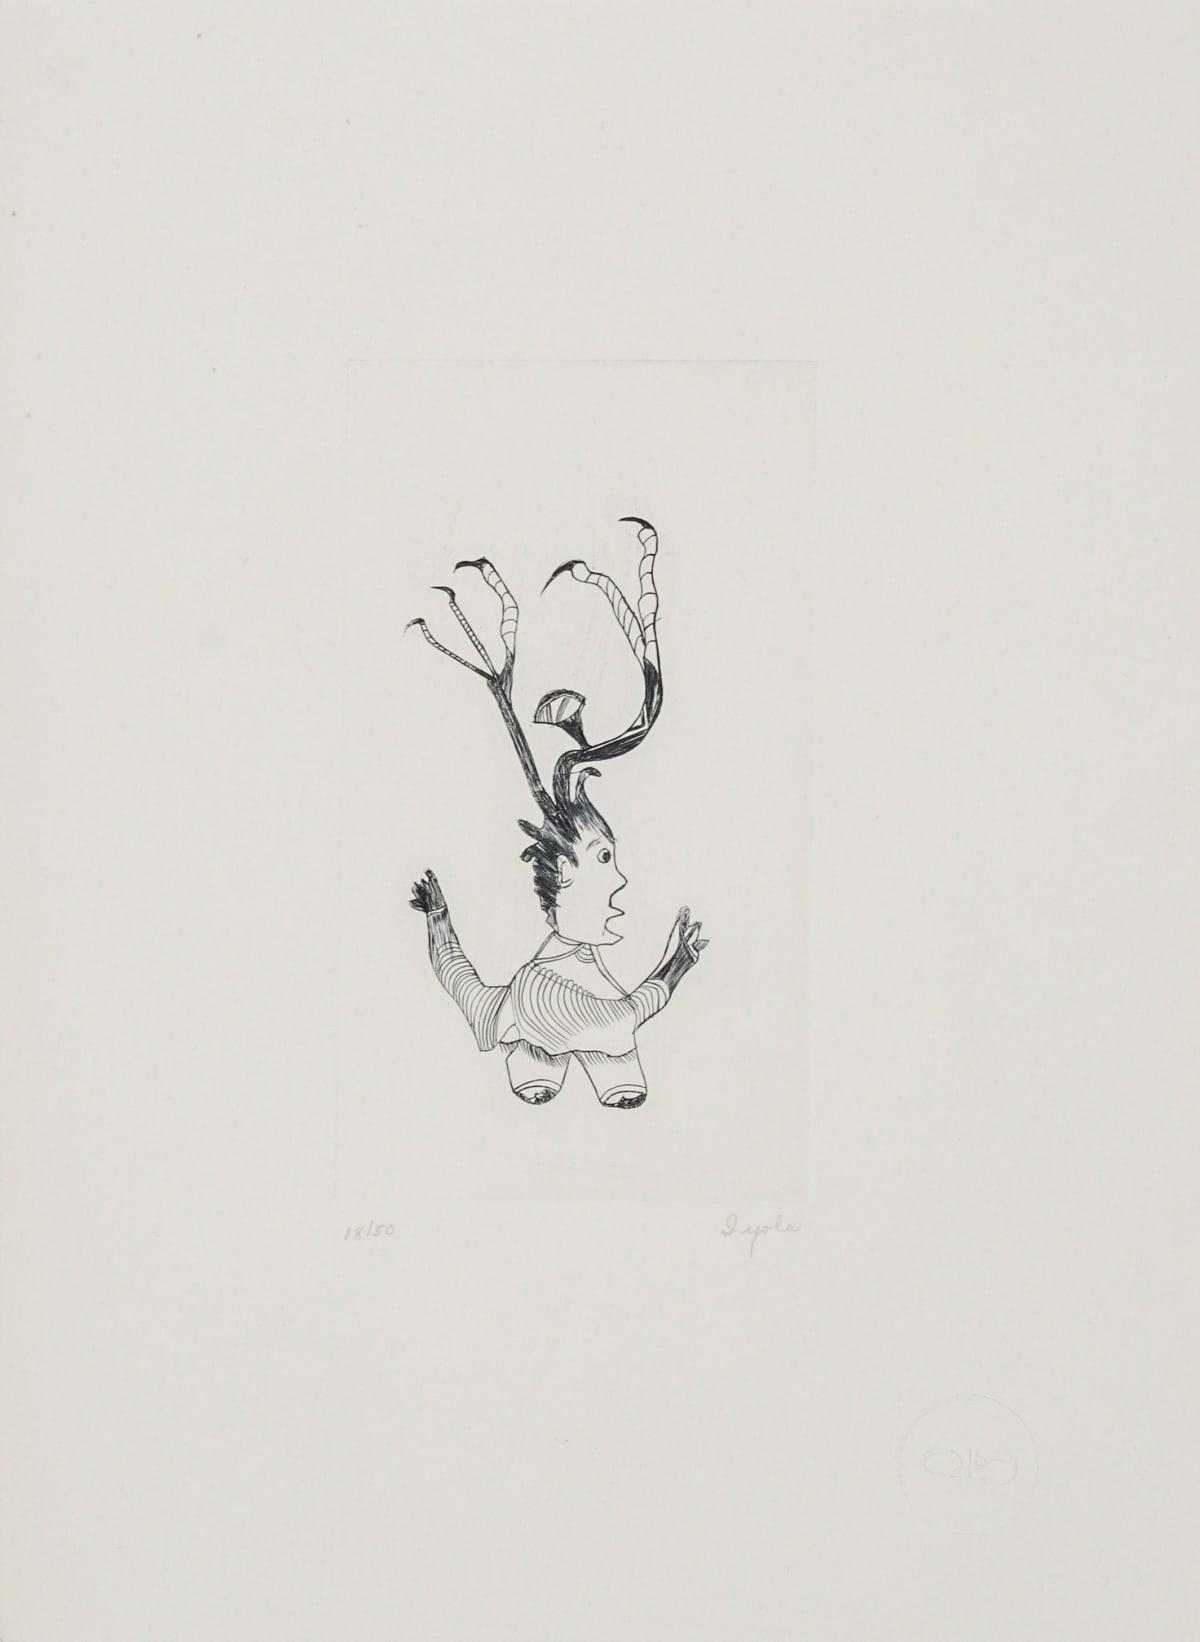 LOT 70 IYOLA KINGWATSIAK (1933-2000) KINNGAIT (CAPE DORSET) Untitled (2-62), 1962 engraving plate: 6 3/4 x 3 3/4 in (17.1 x 9.5 cm) sheet: 13 x 9 1/2 in (33 x 24.1 cm) ESTIMATE: $400 — $600